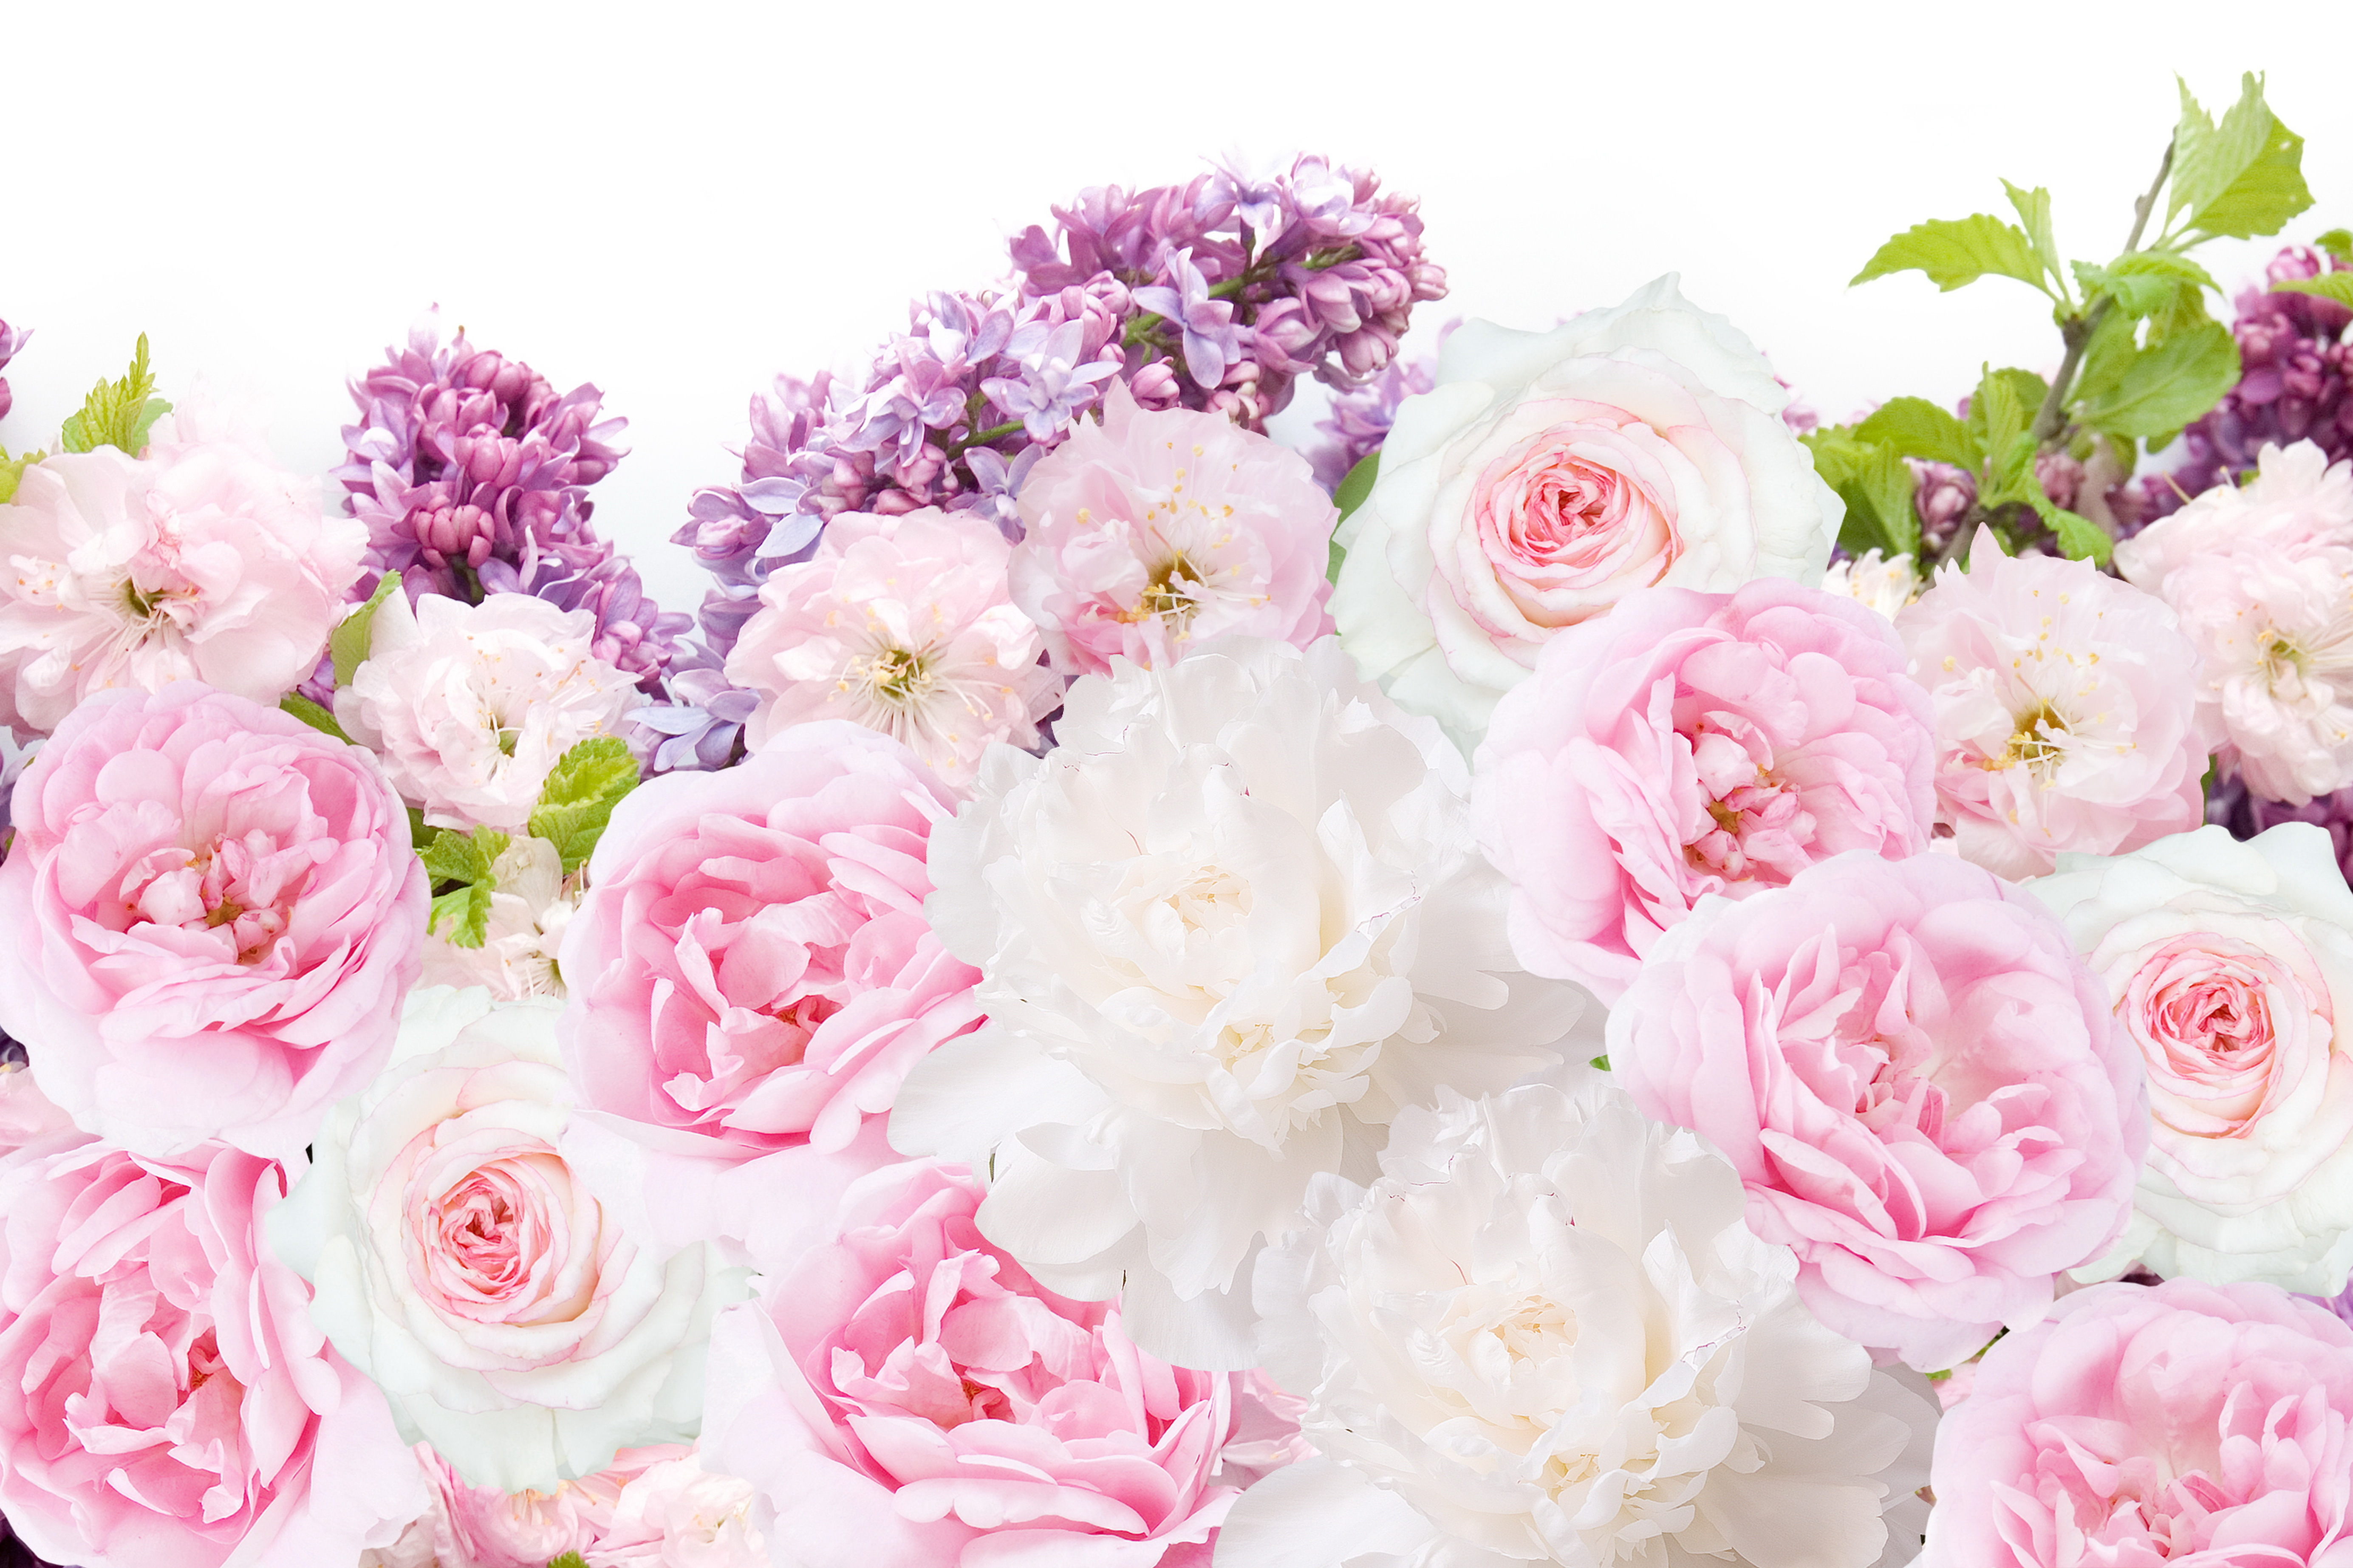 Wallpaper Rose Flowers Syringa Peonies 5538x3691